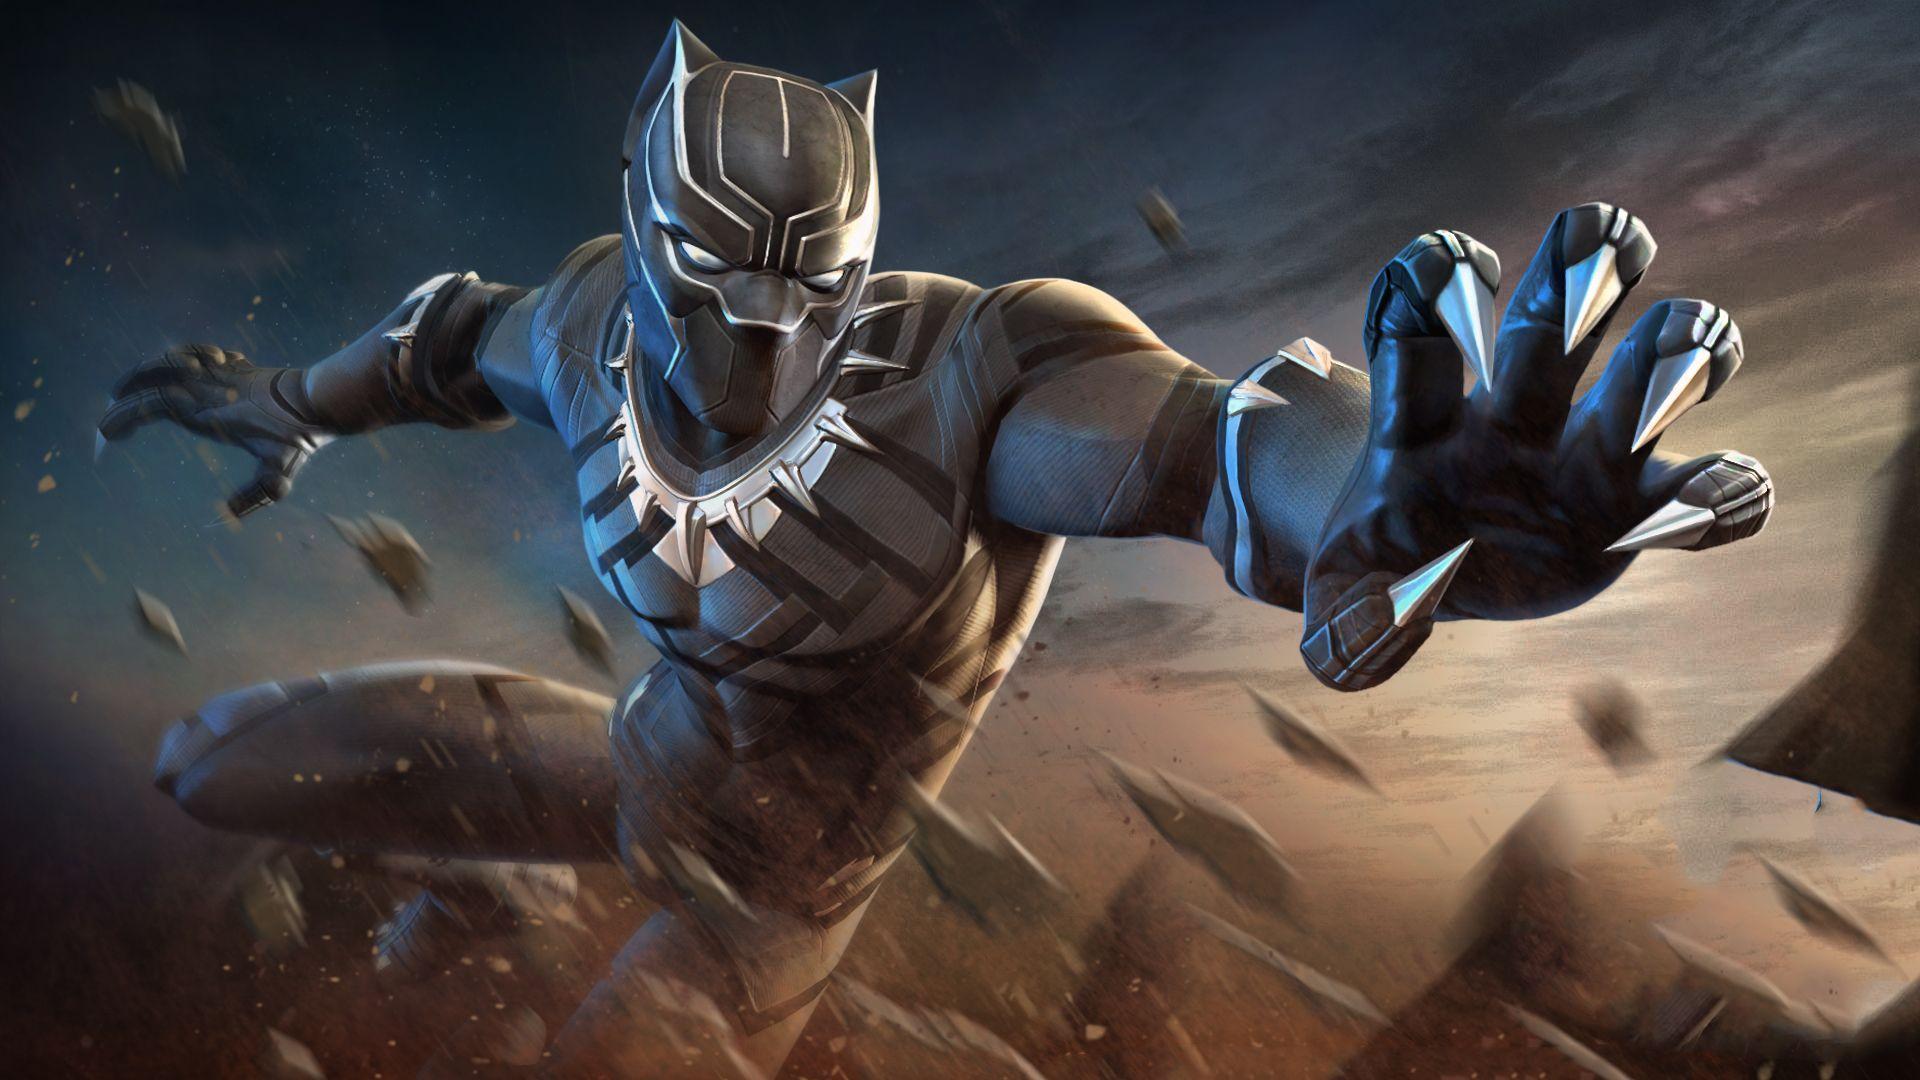 Black Panther Marvel Wallpapers Top Free Black Panther Marvel Backgrounds Wallpaperaccess